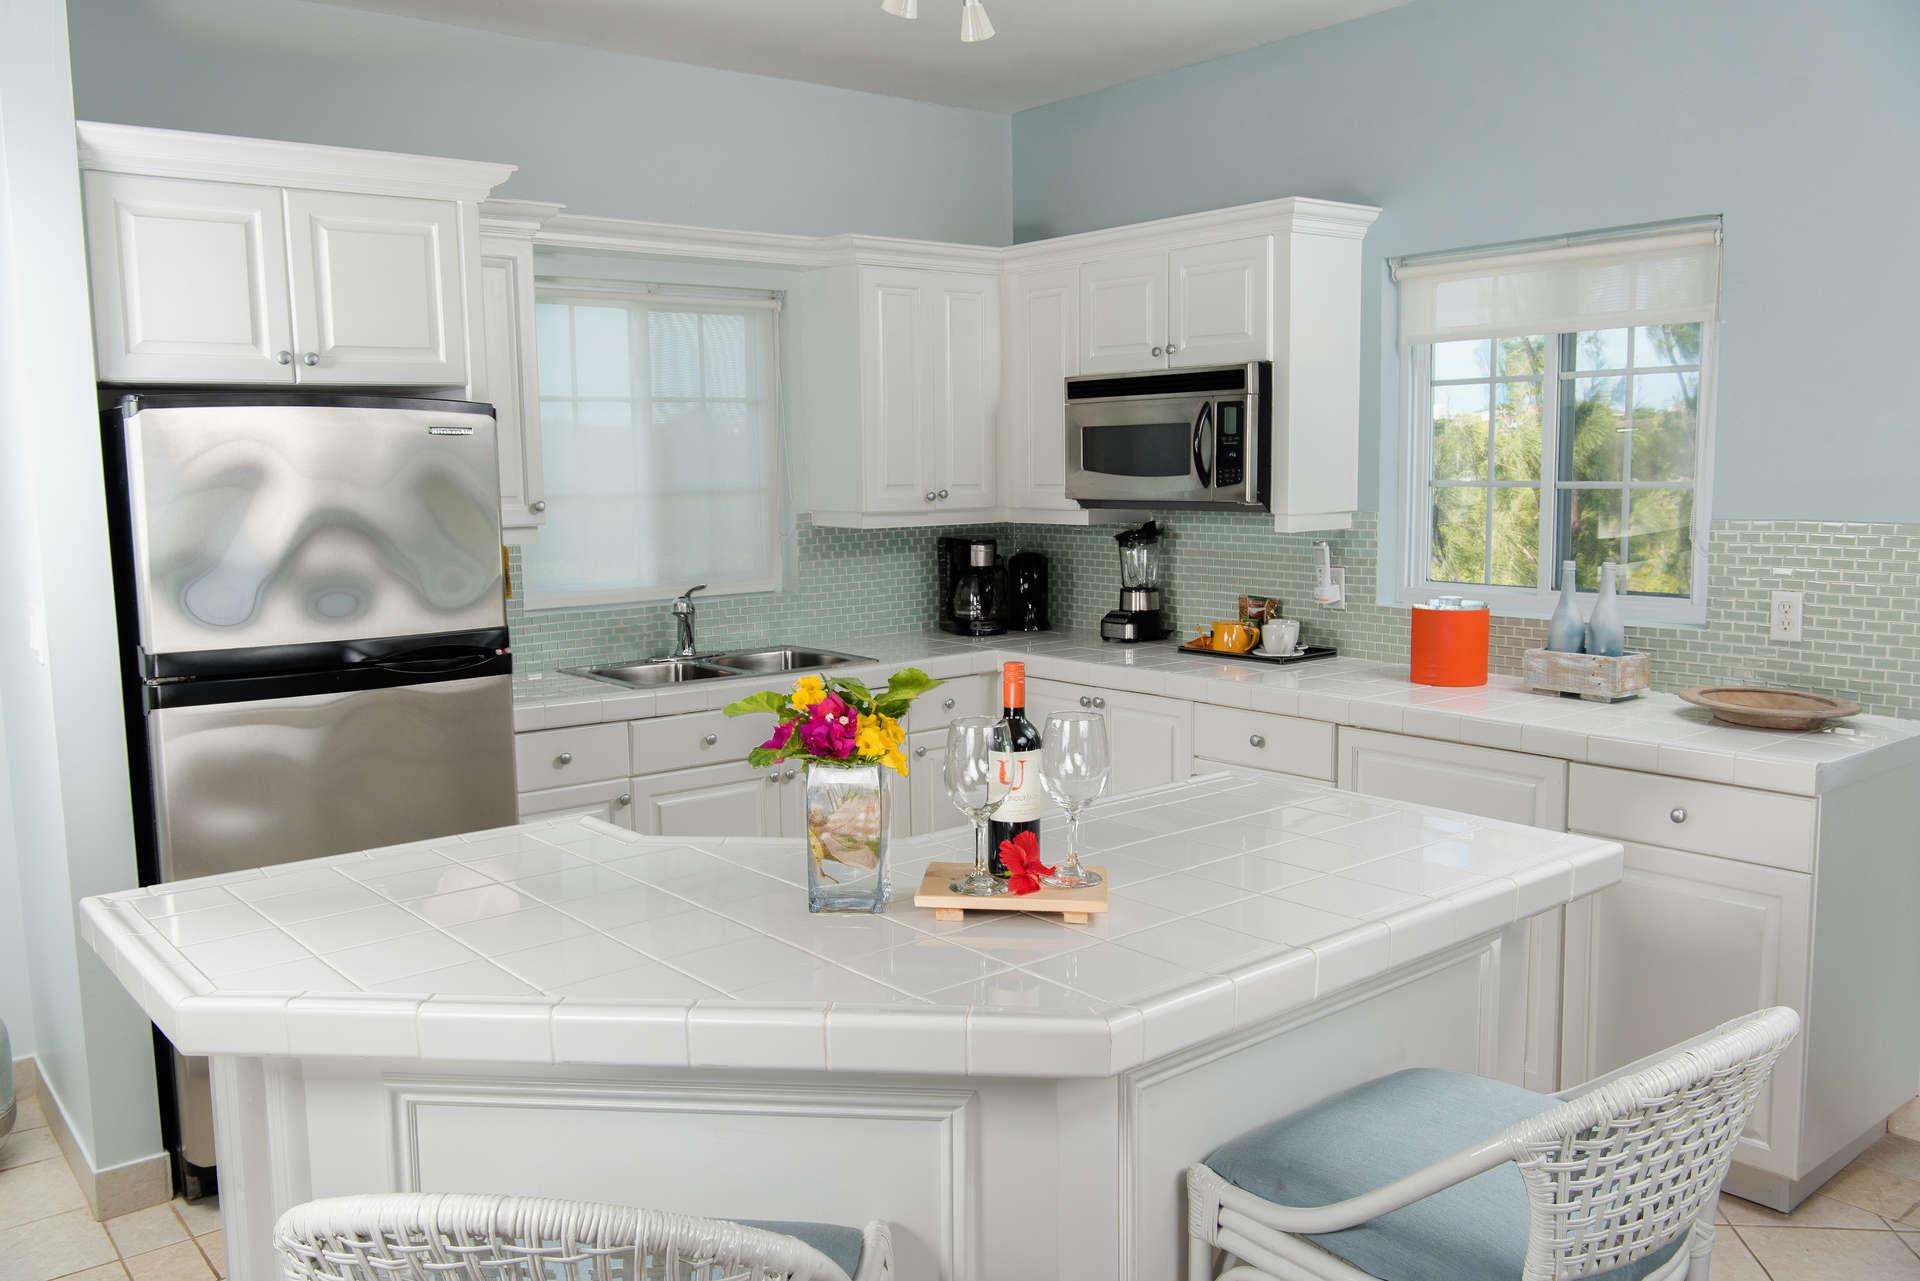 Luxury villa rentals caribbean - Turks and caicos - Providenciales - Beach house turks caicos - Pool View Suite | 2 Bedroom - Image 1/10